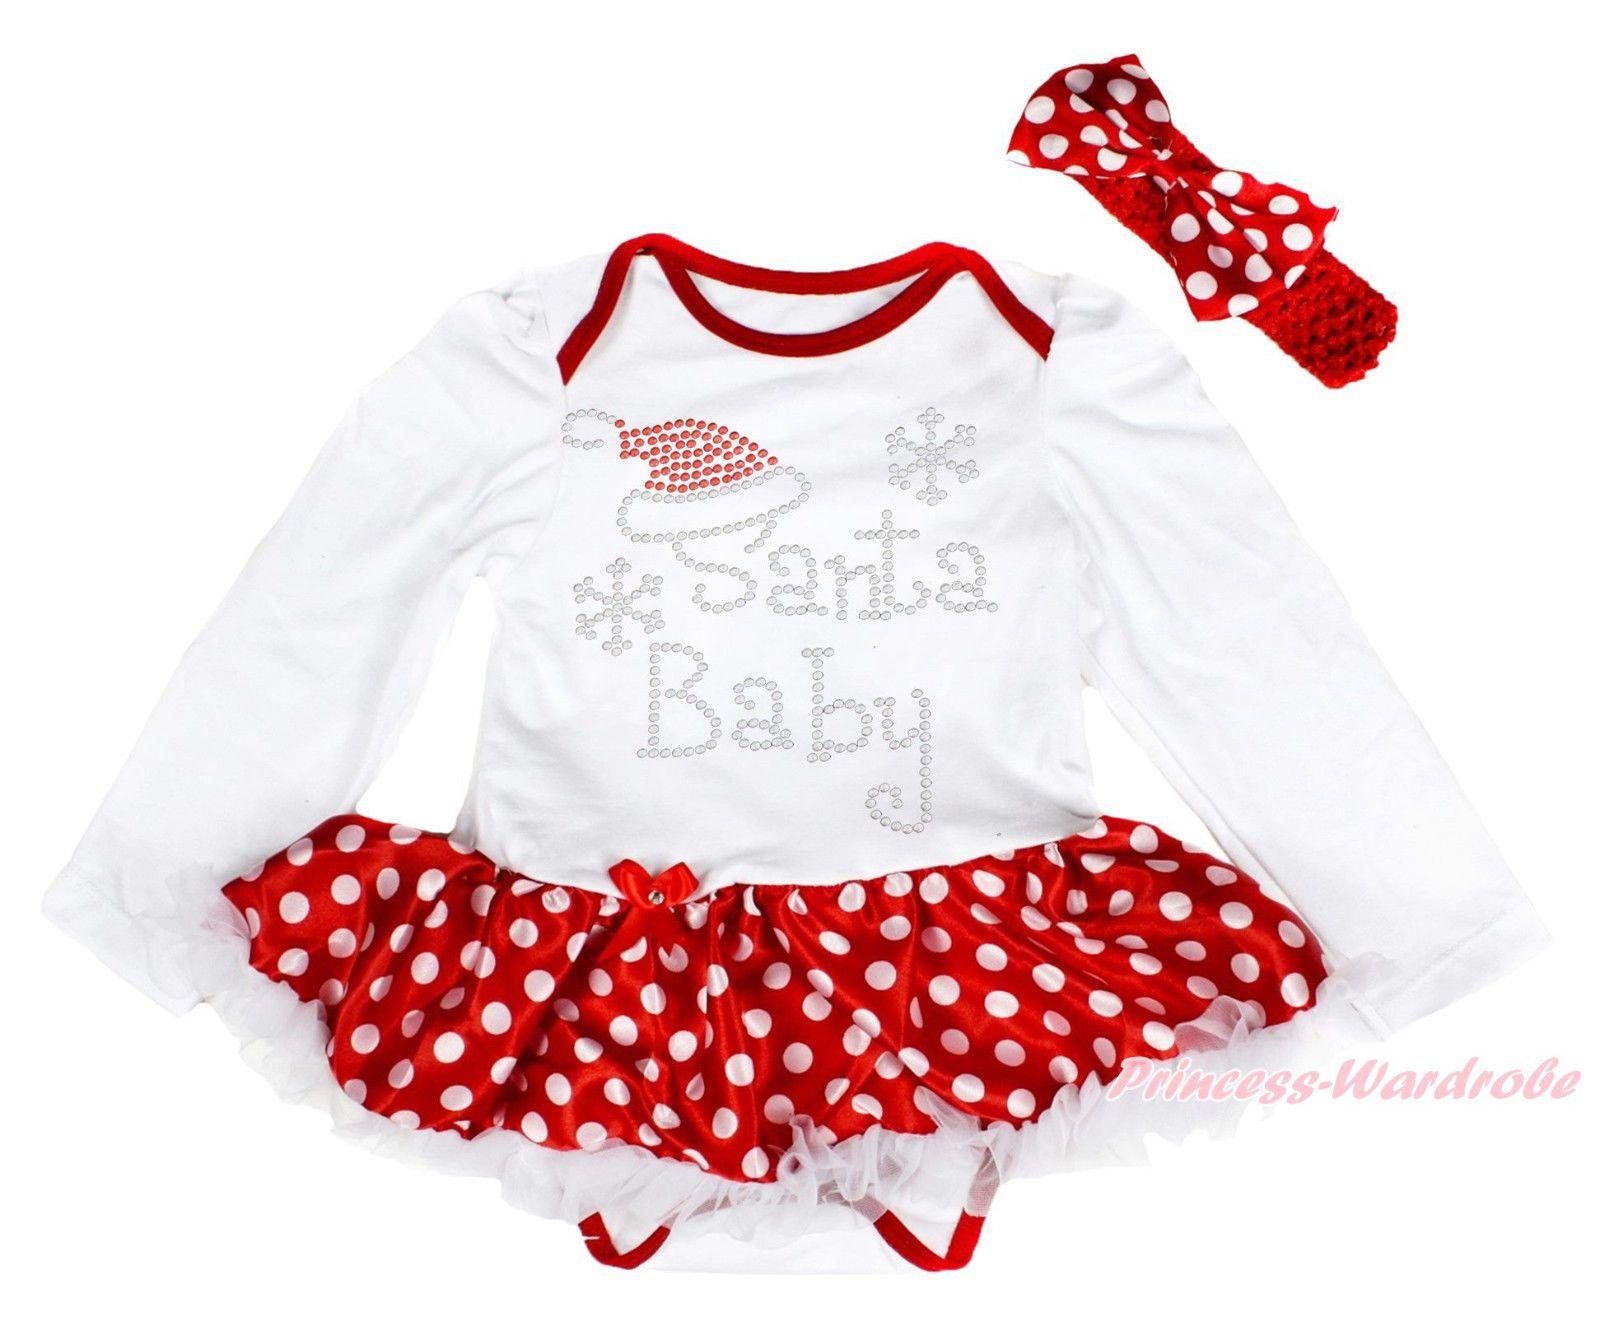 Xmas rhinesotone santa baby ls bodysuit minnie girl skirt dress nb